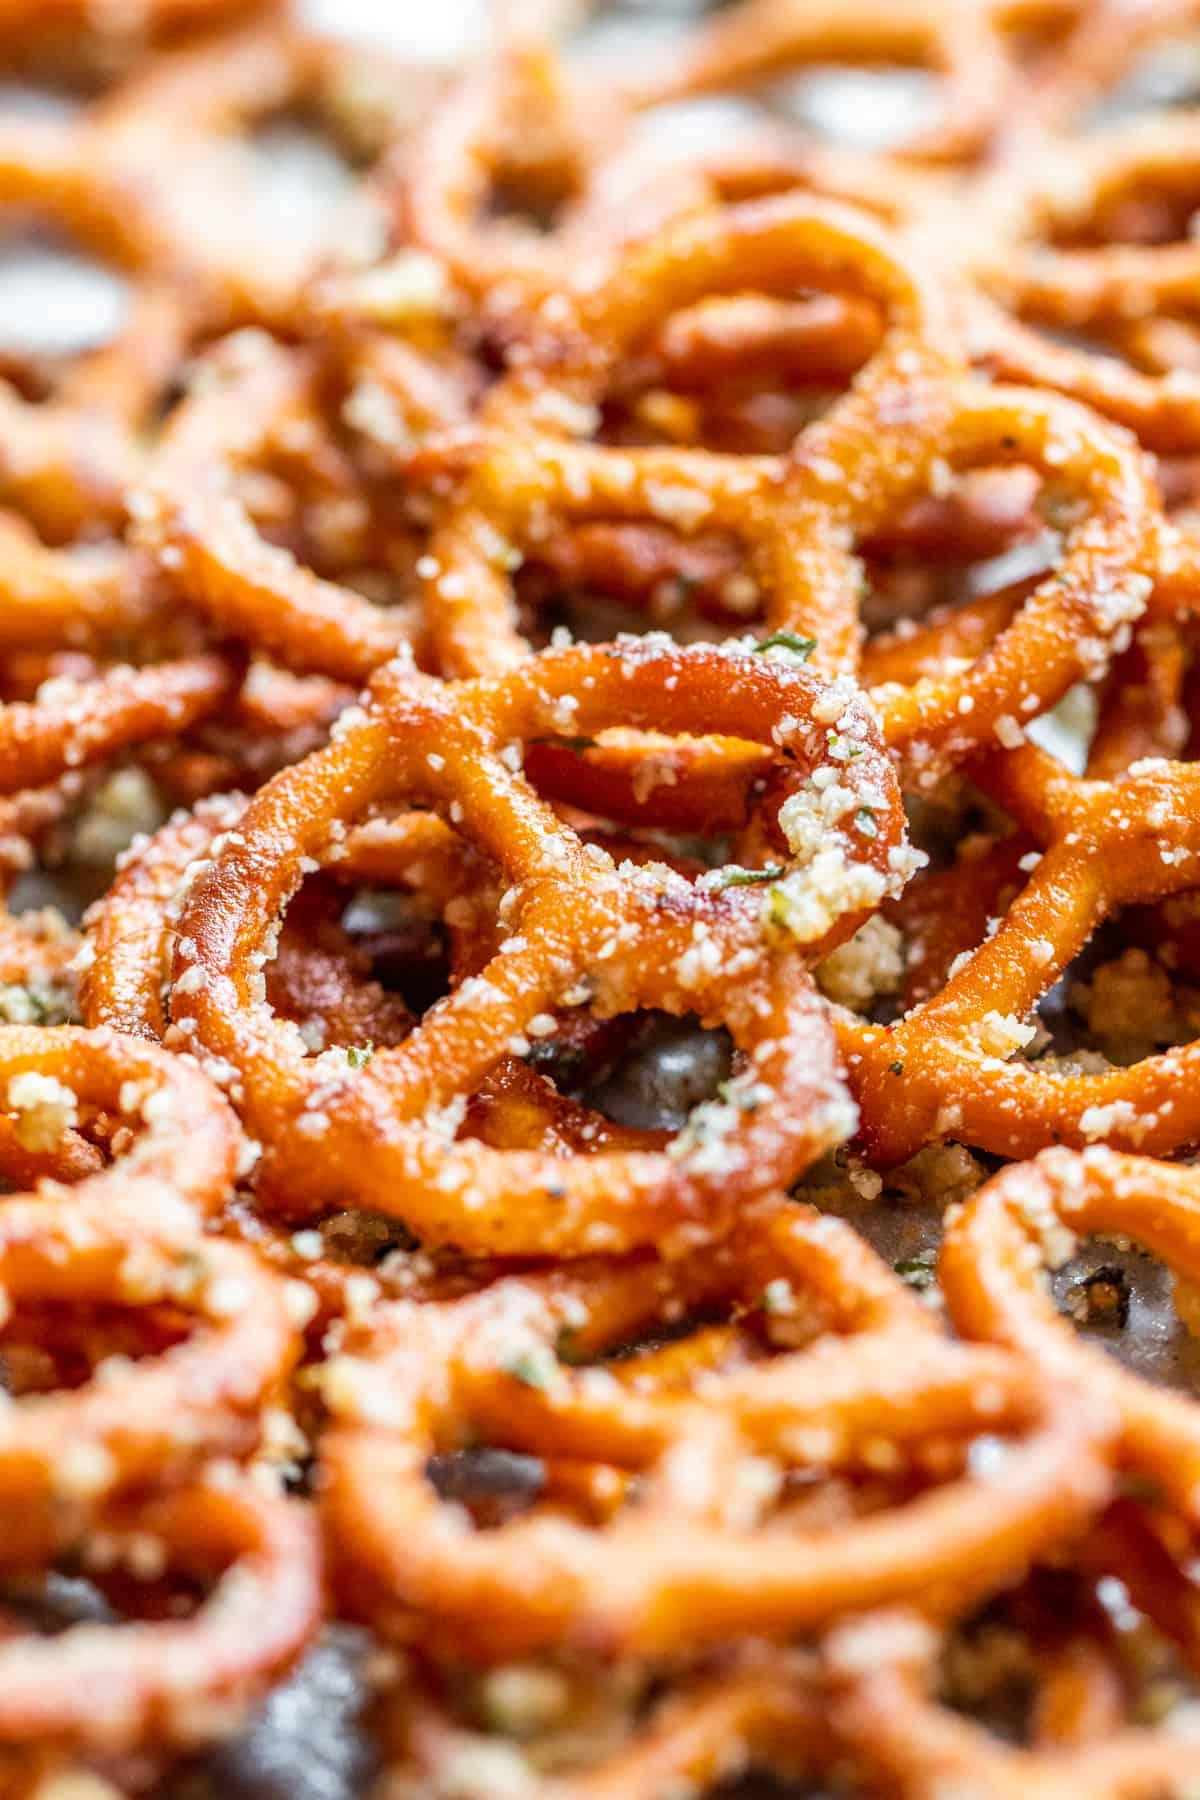 Close up shot of garlic parmesan pretzels on cookie sheet.